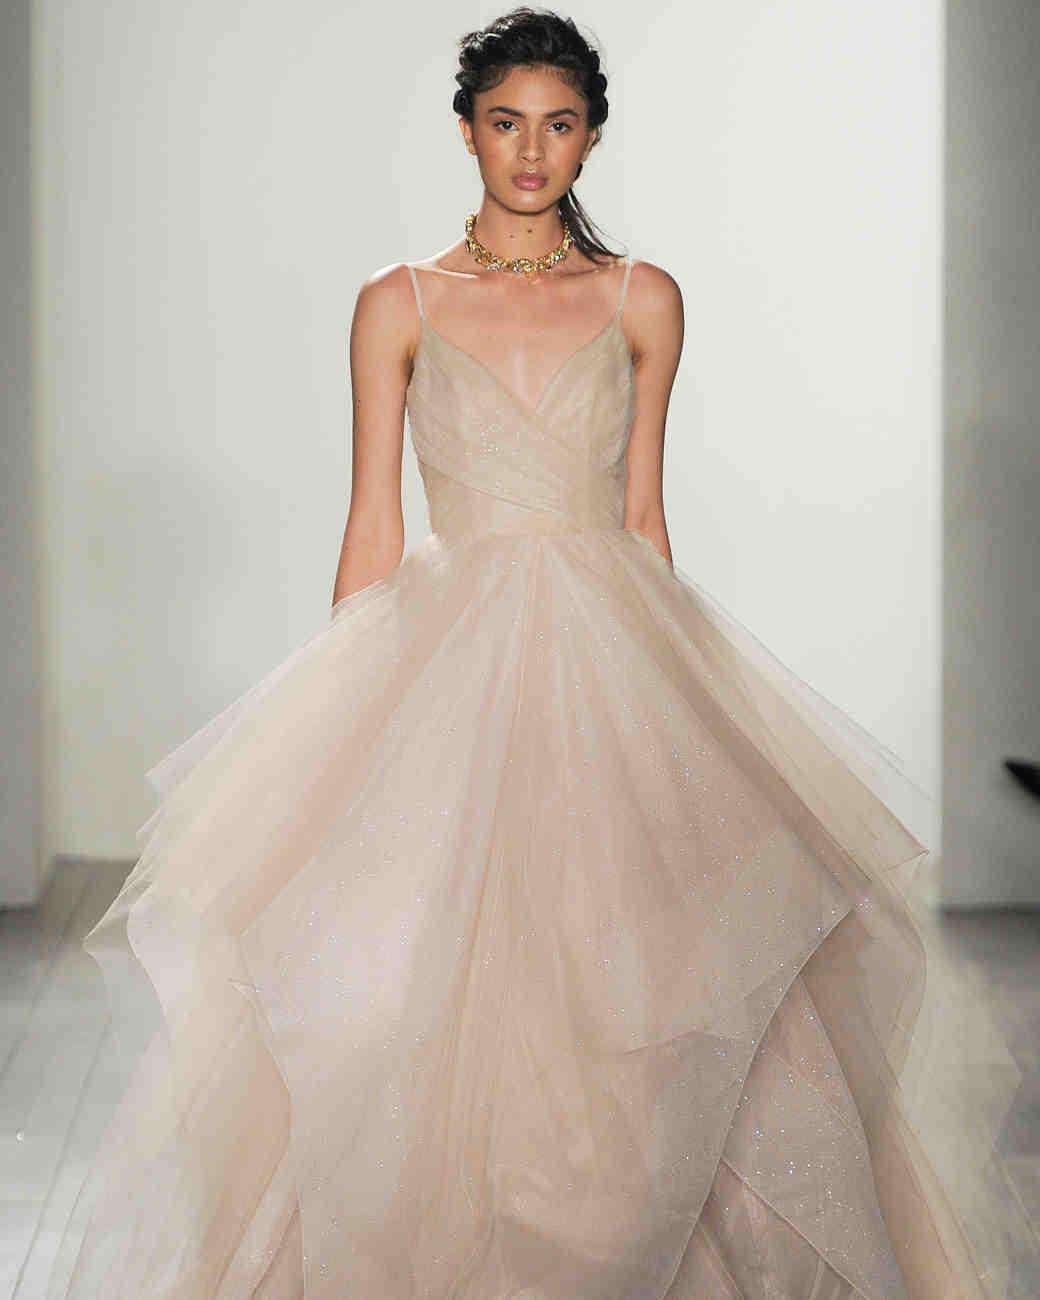 hayley paige wedding dresses fall hayley paige wedding dresses Hayley Paige Fall Wedding Dress Collection Martha Stewart Weddings